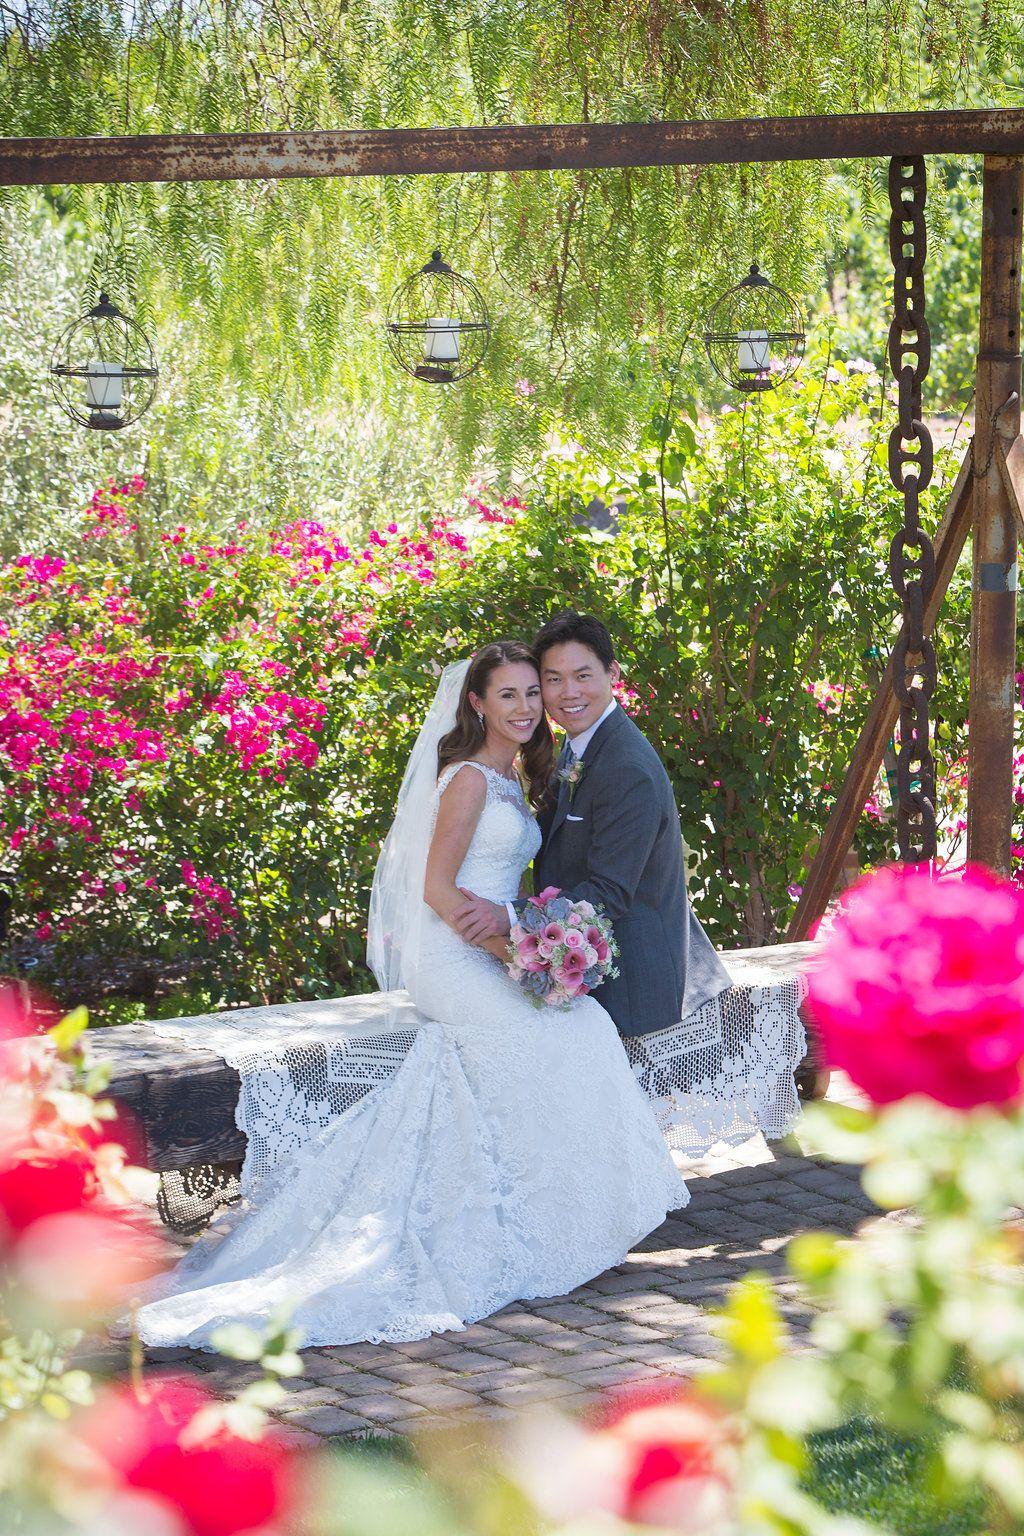 Pin by Villa de Amore California Weddings on New Swing